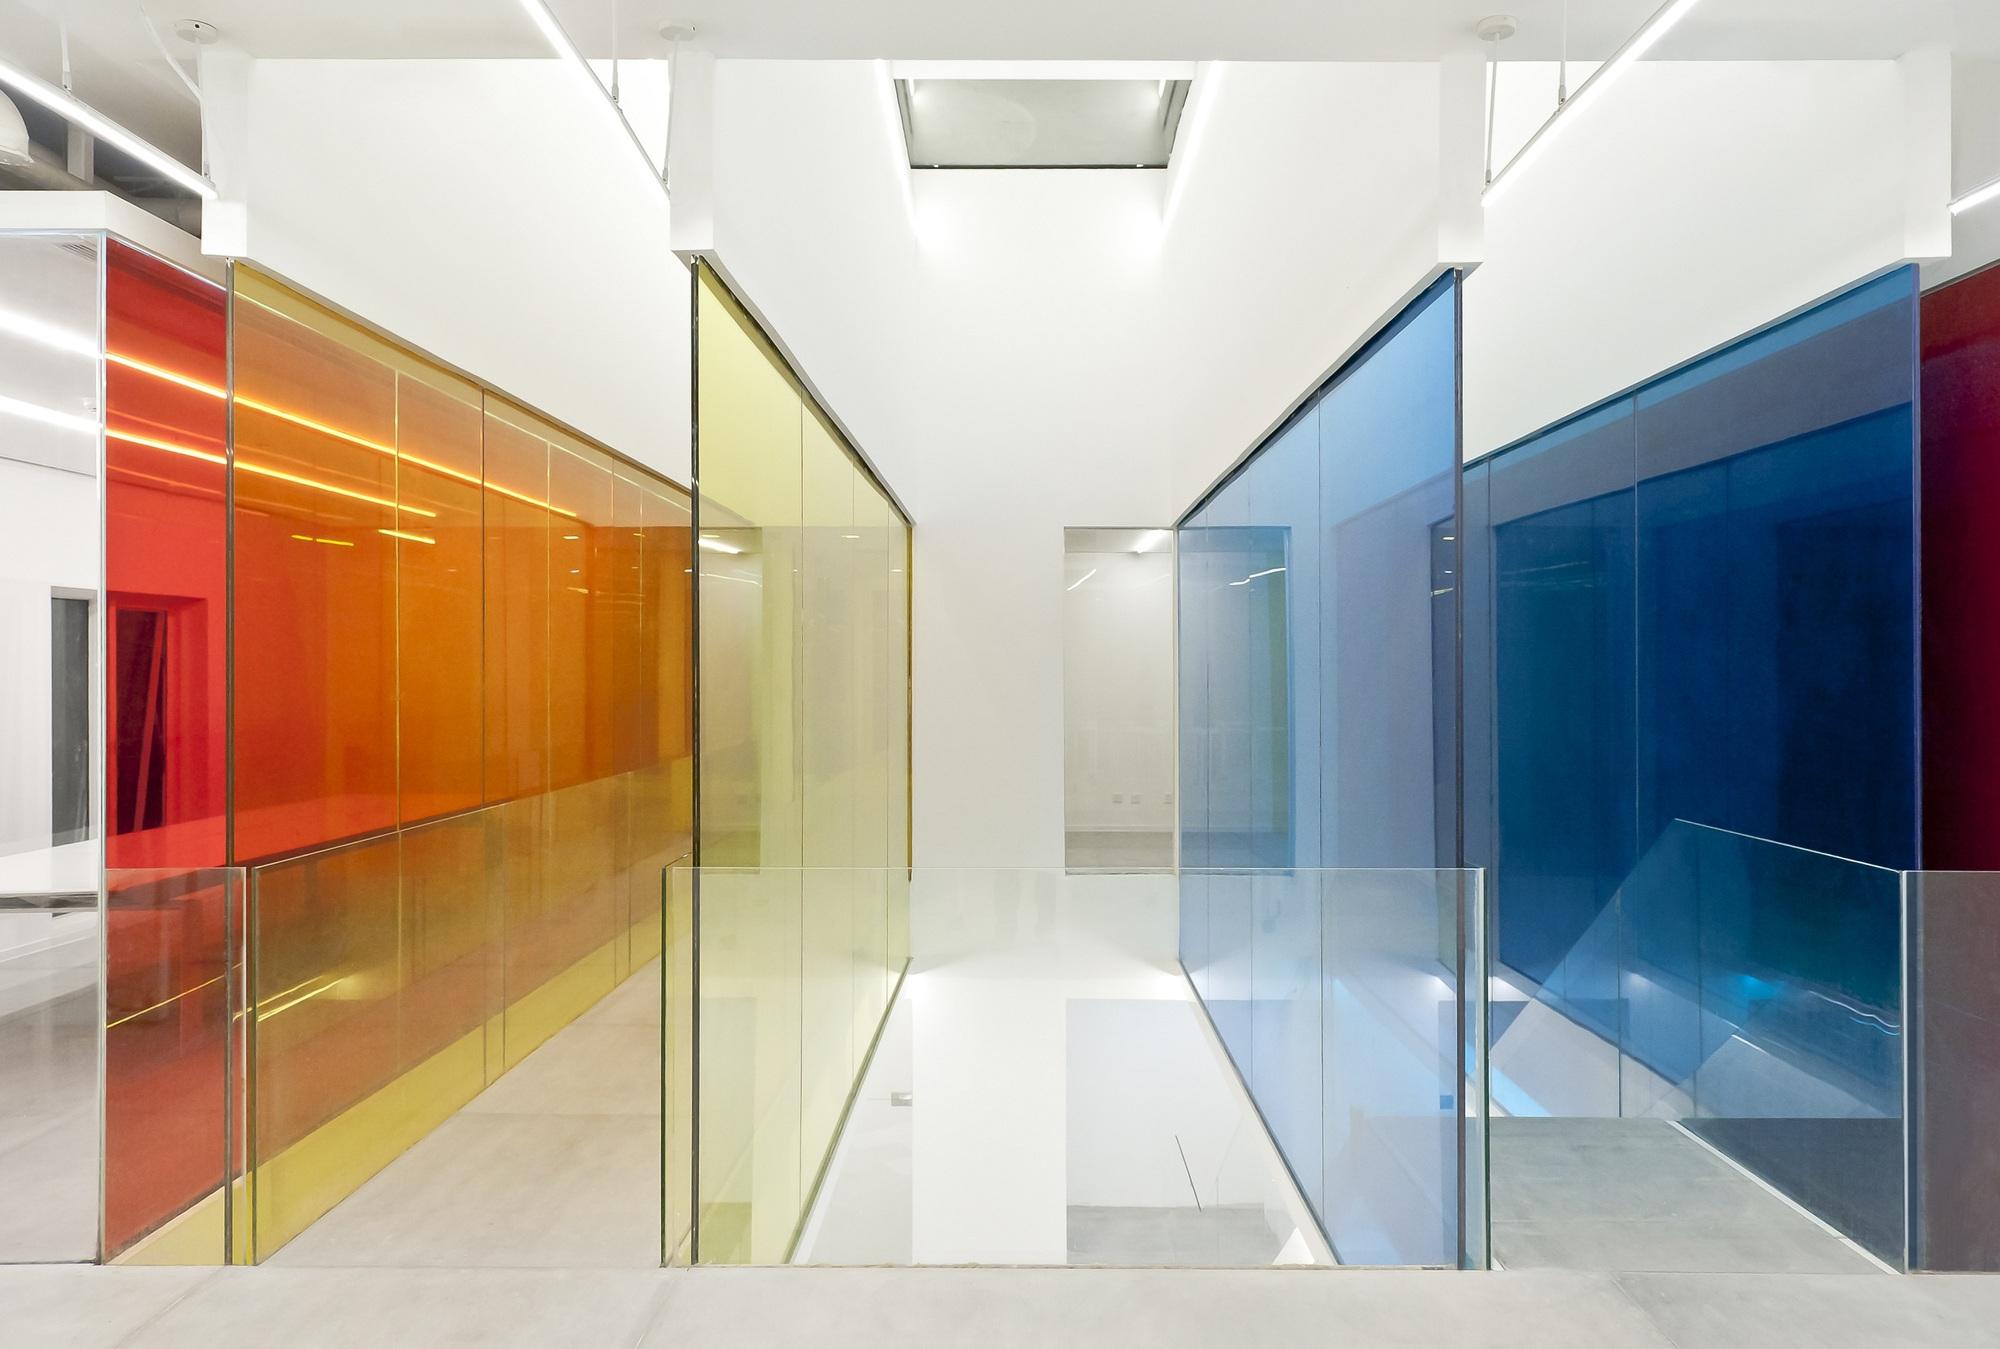 Sede da 21 Cake / People's Architecture Office, © Cortesia de People's Architecture Office